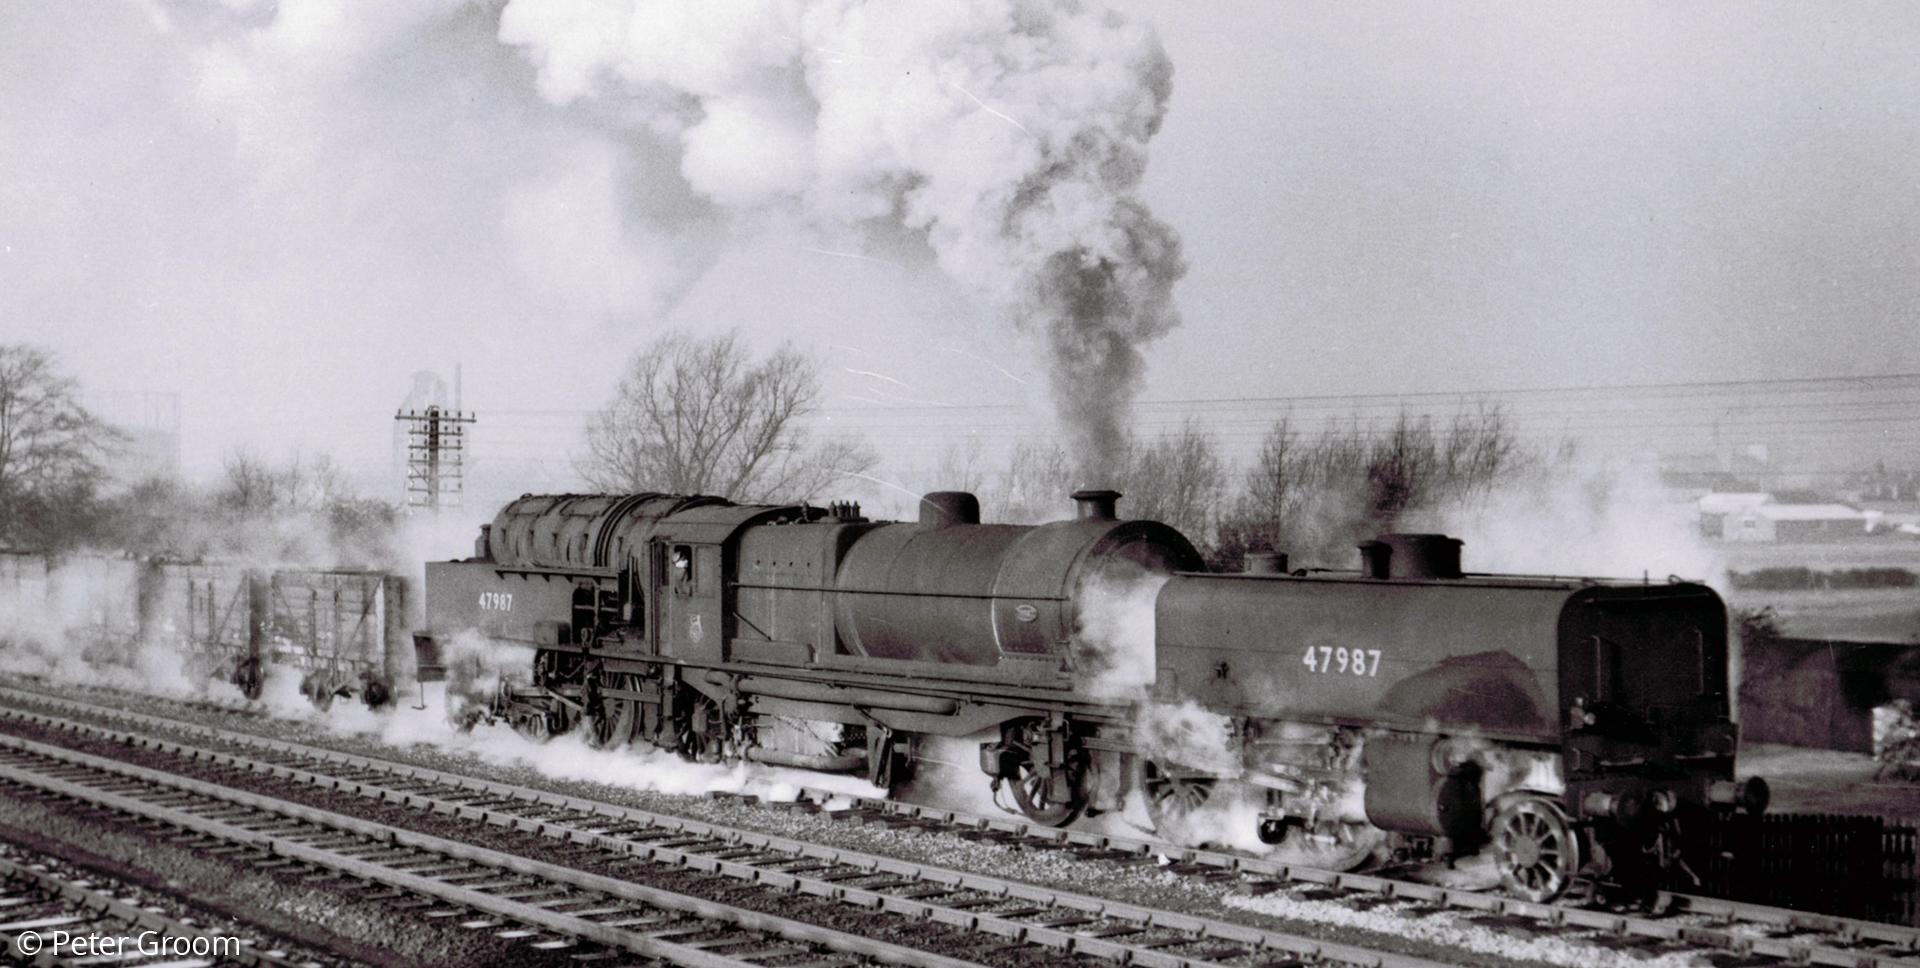 47987 at Melton Mowbray in December 1954. © Peter Groom